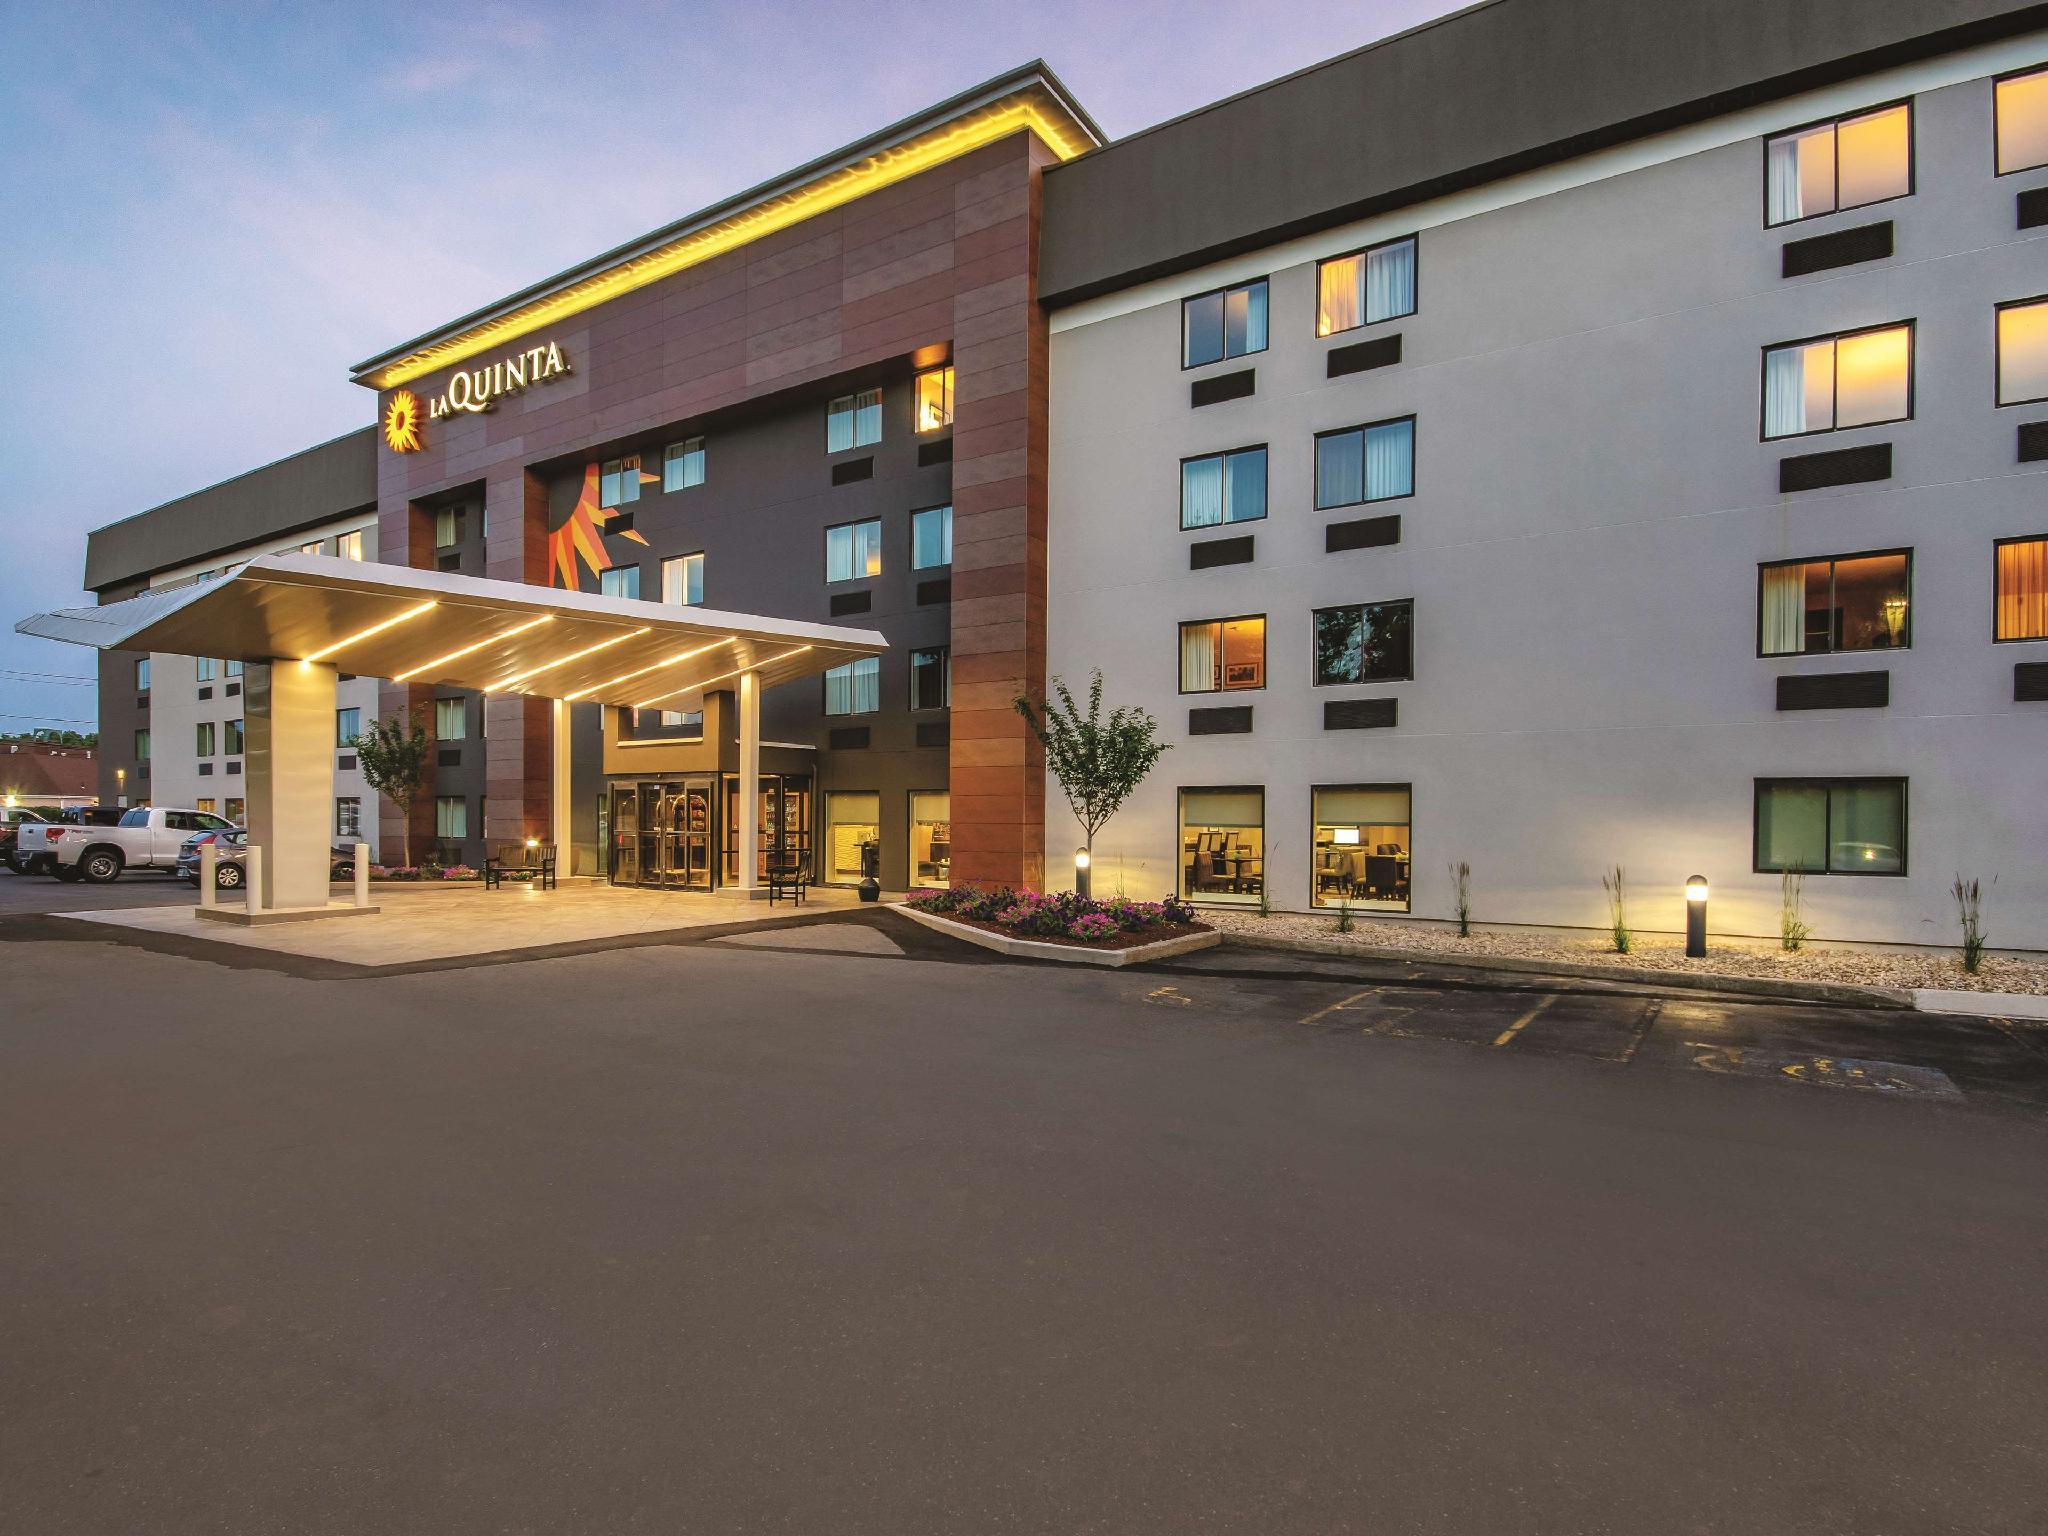 La Quinta Inn And Suites By Wyndham Hartford   Bradley Airport